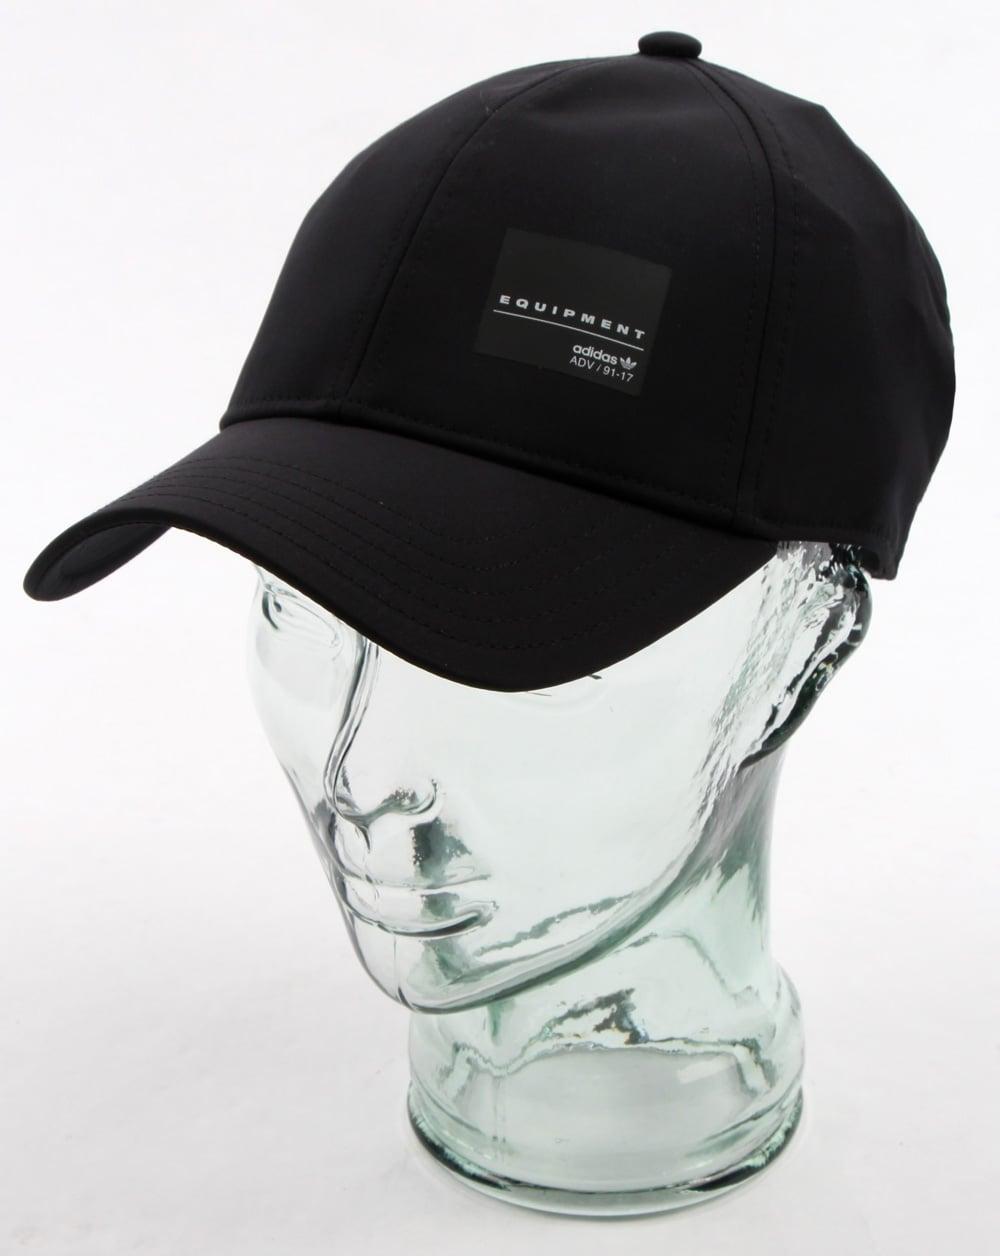 adidas Originals Adidas Originals Eqt Classic Cap Black white 40e7d8b0581